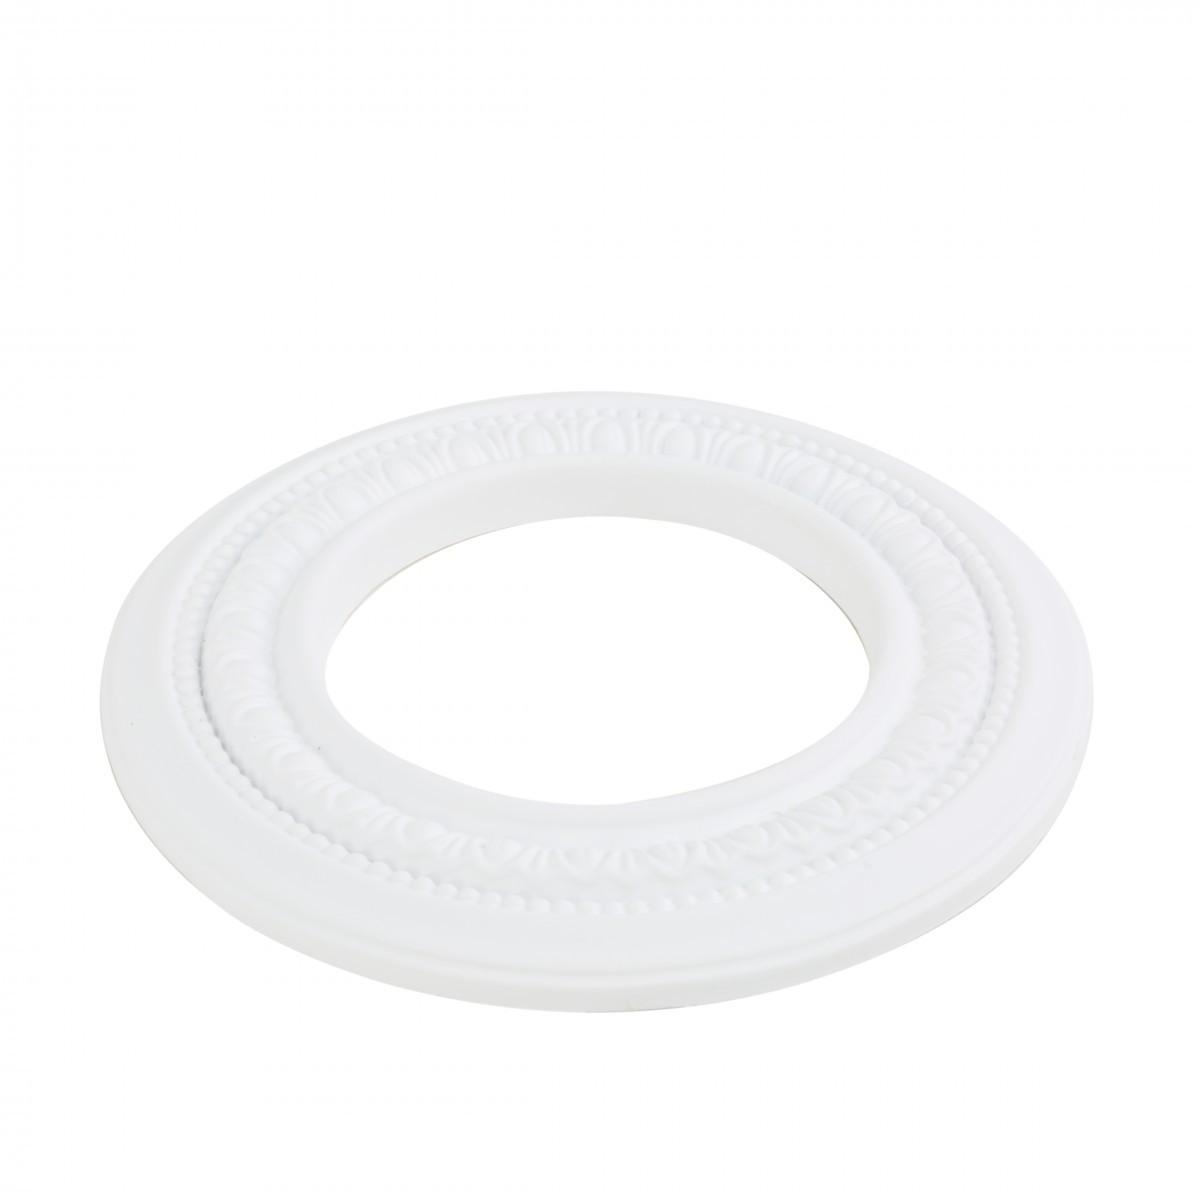 Mini Medallion Spot Light Ring White Trim 5 Inch ID x 9 Inch OD White Recessed Light Trim Decorative Recessed Lighting Trim Spotlight Ceiling Medallion